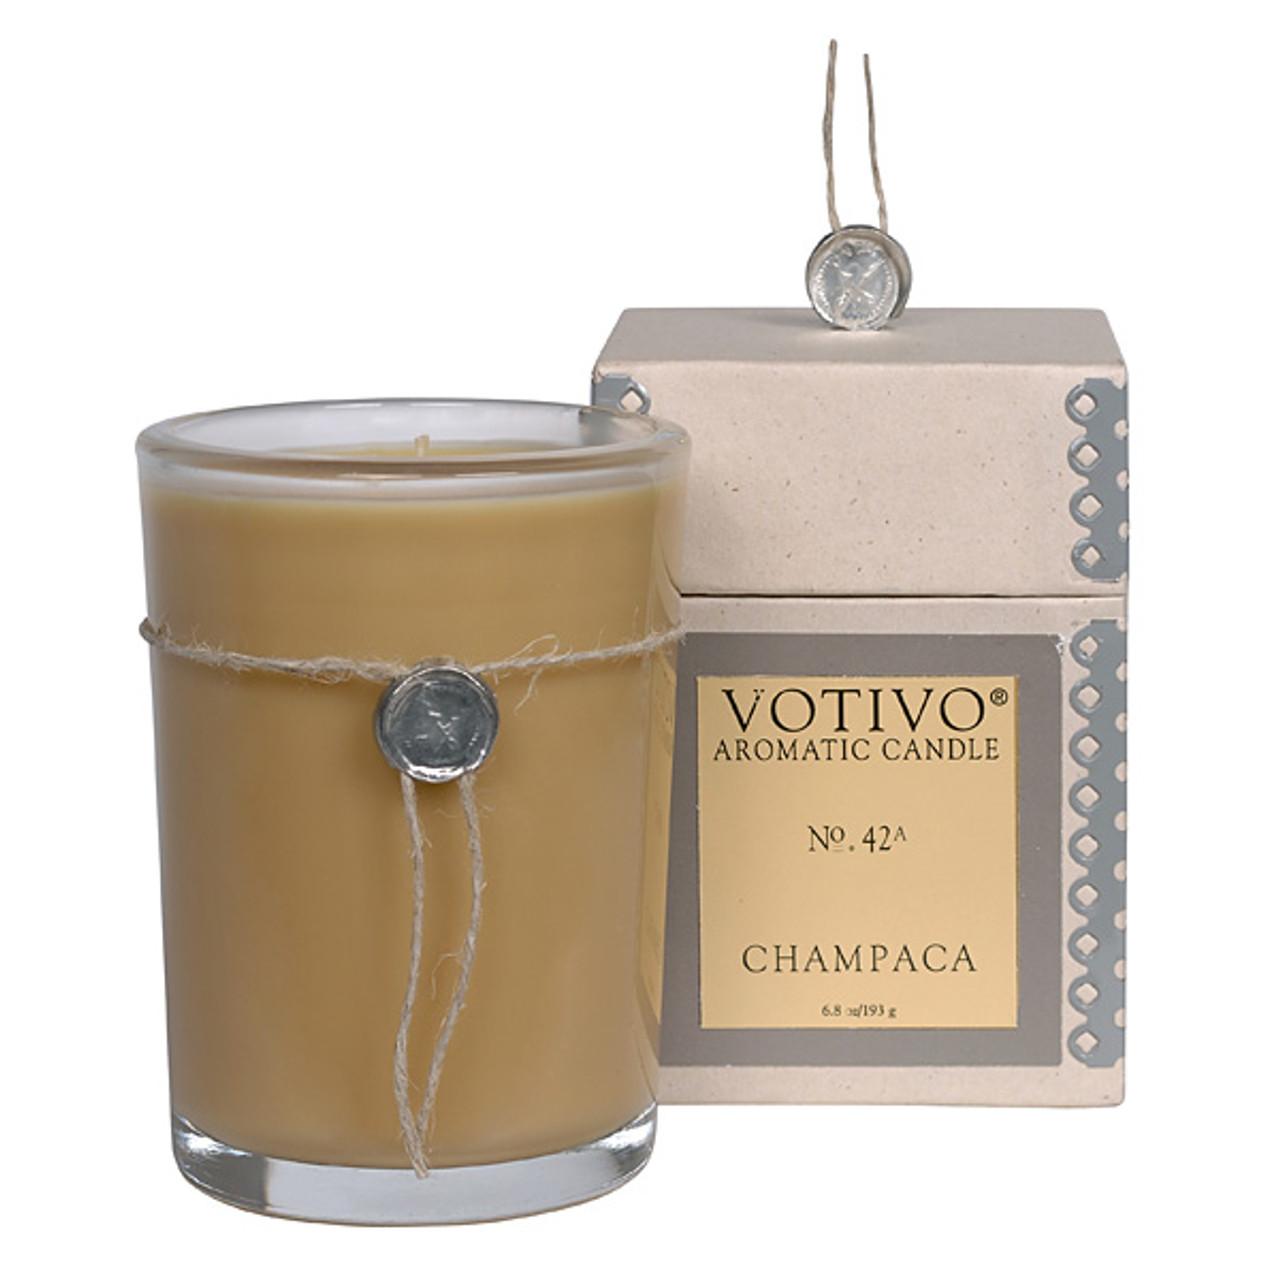 Champaca Aromatic Candle